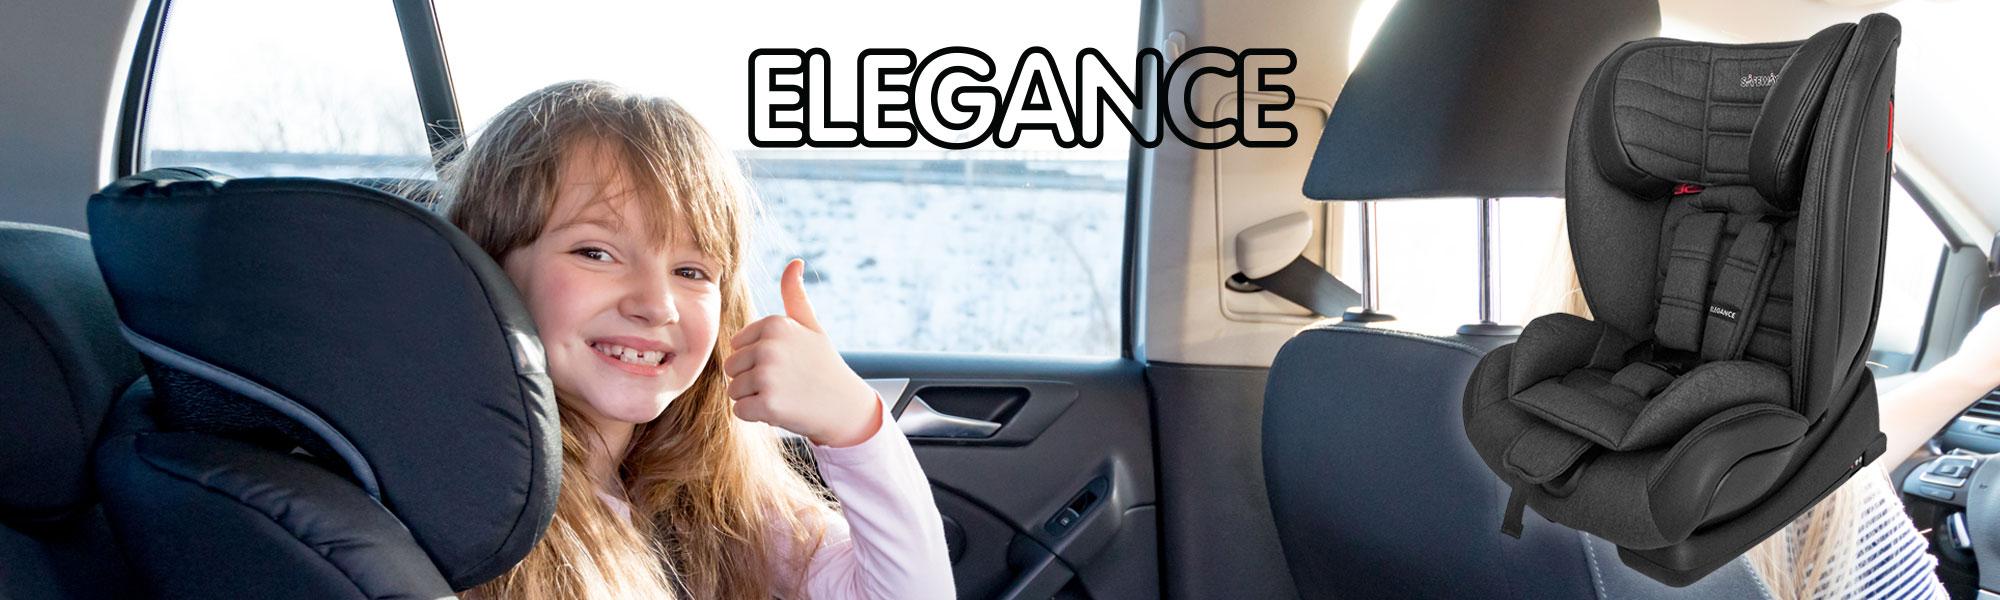 Elegance-2000x600